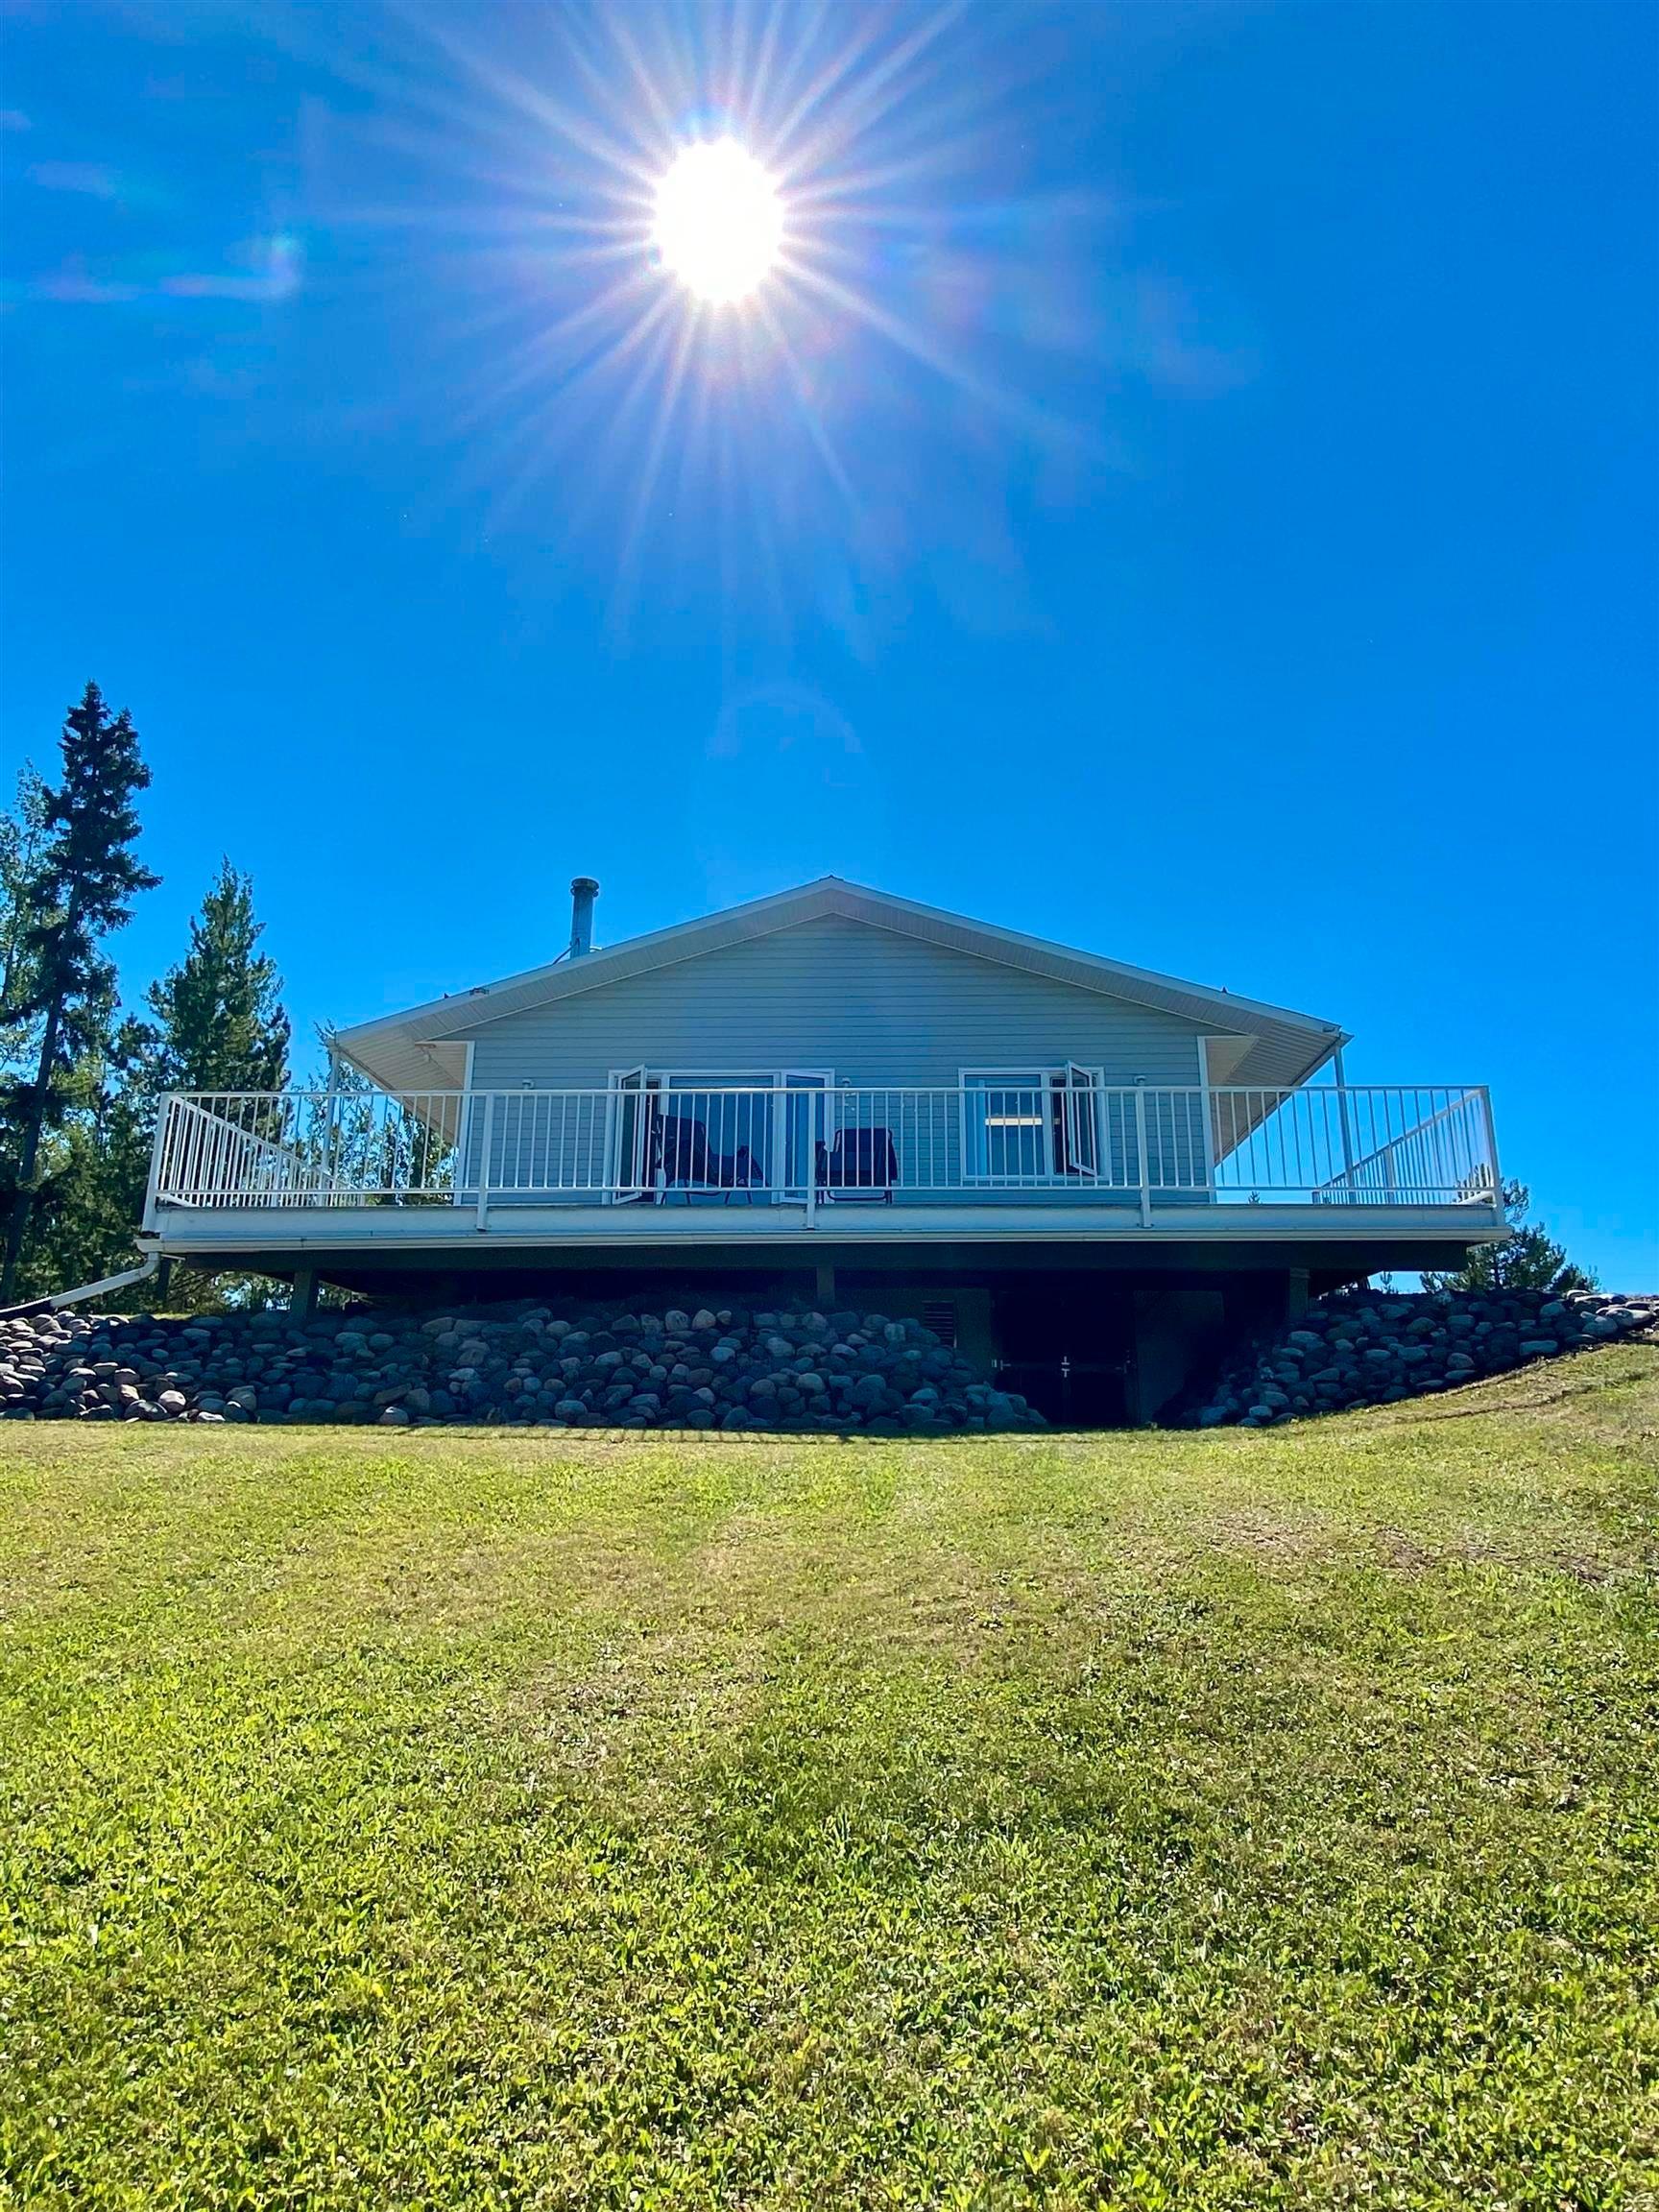 Main Photo: 41860 S BEDNESTI LAKE Road in Prince George: Bednesti House for sale (PG Rural West (Zone 77))  : MLS®# R2609795